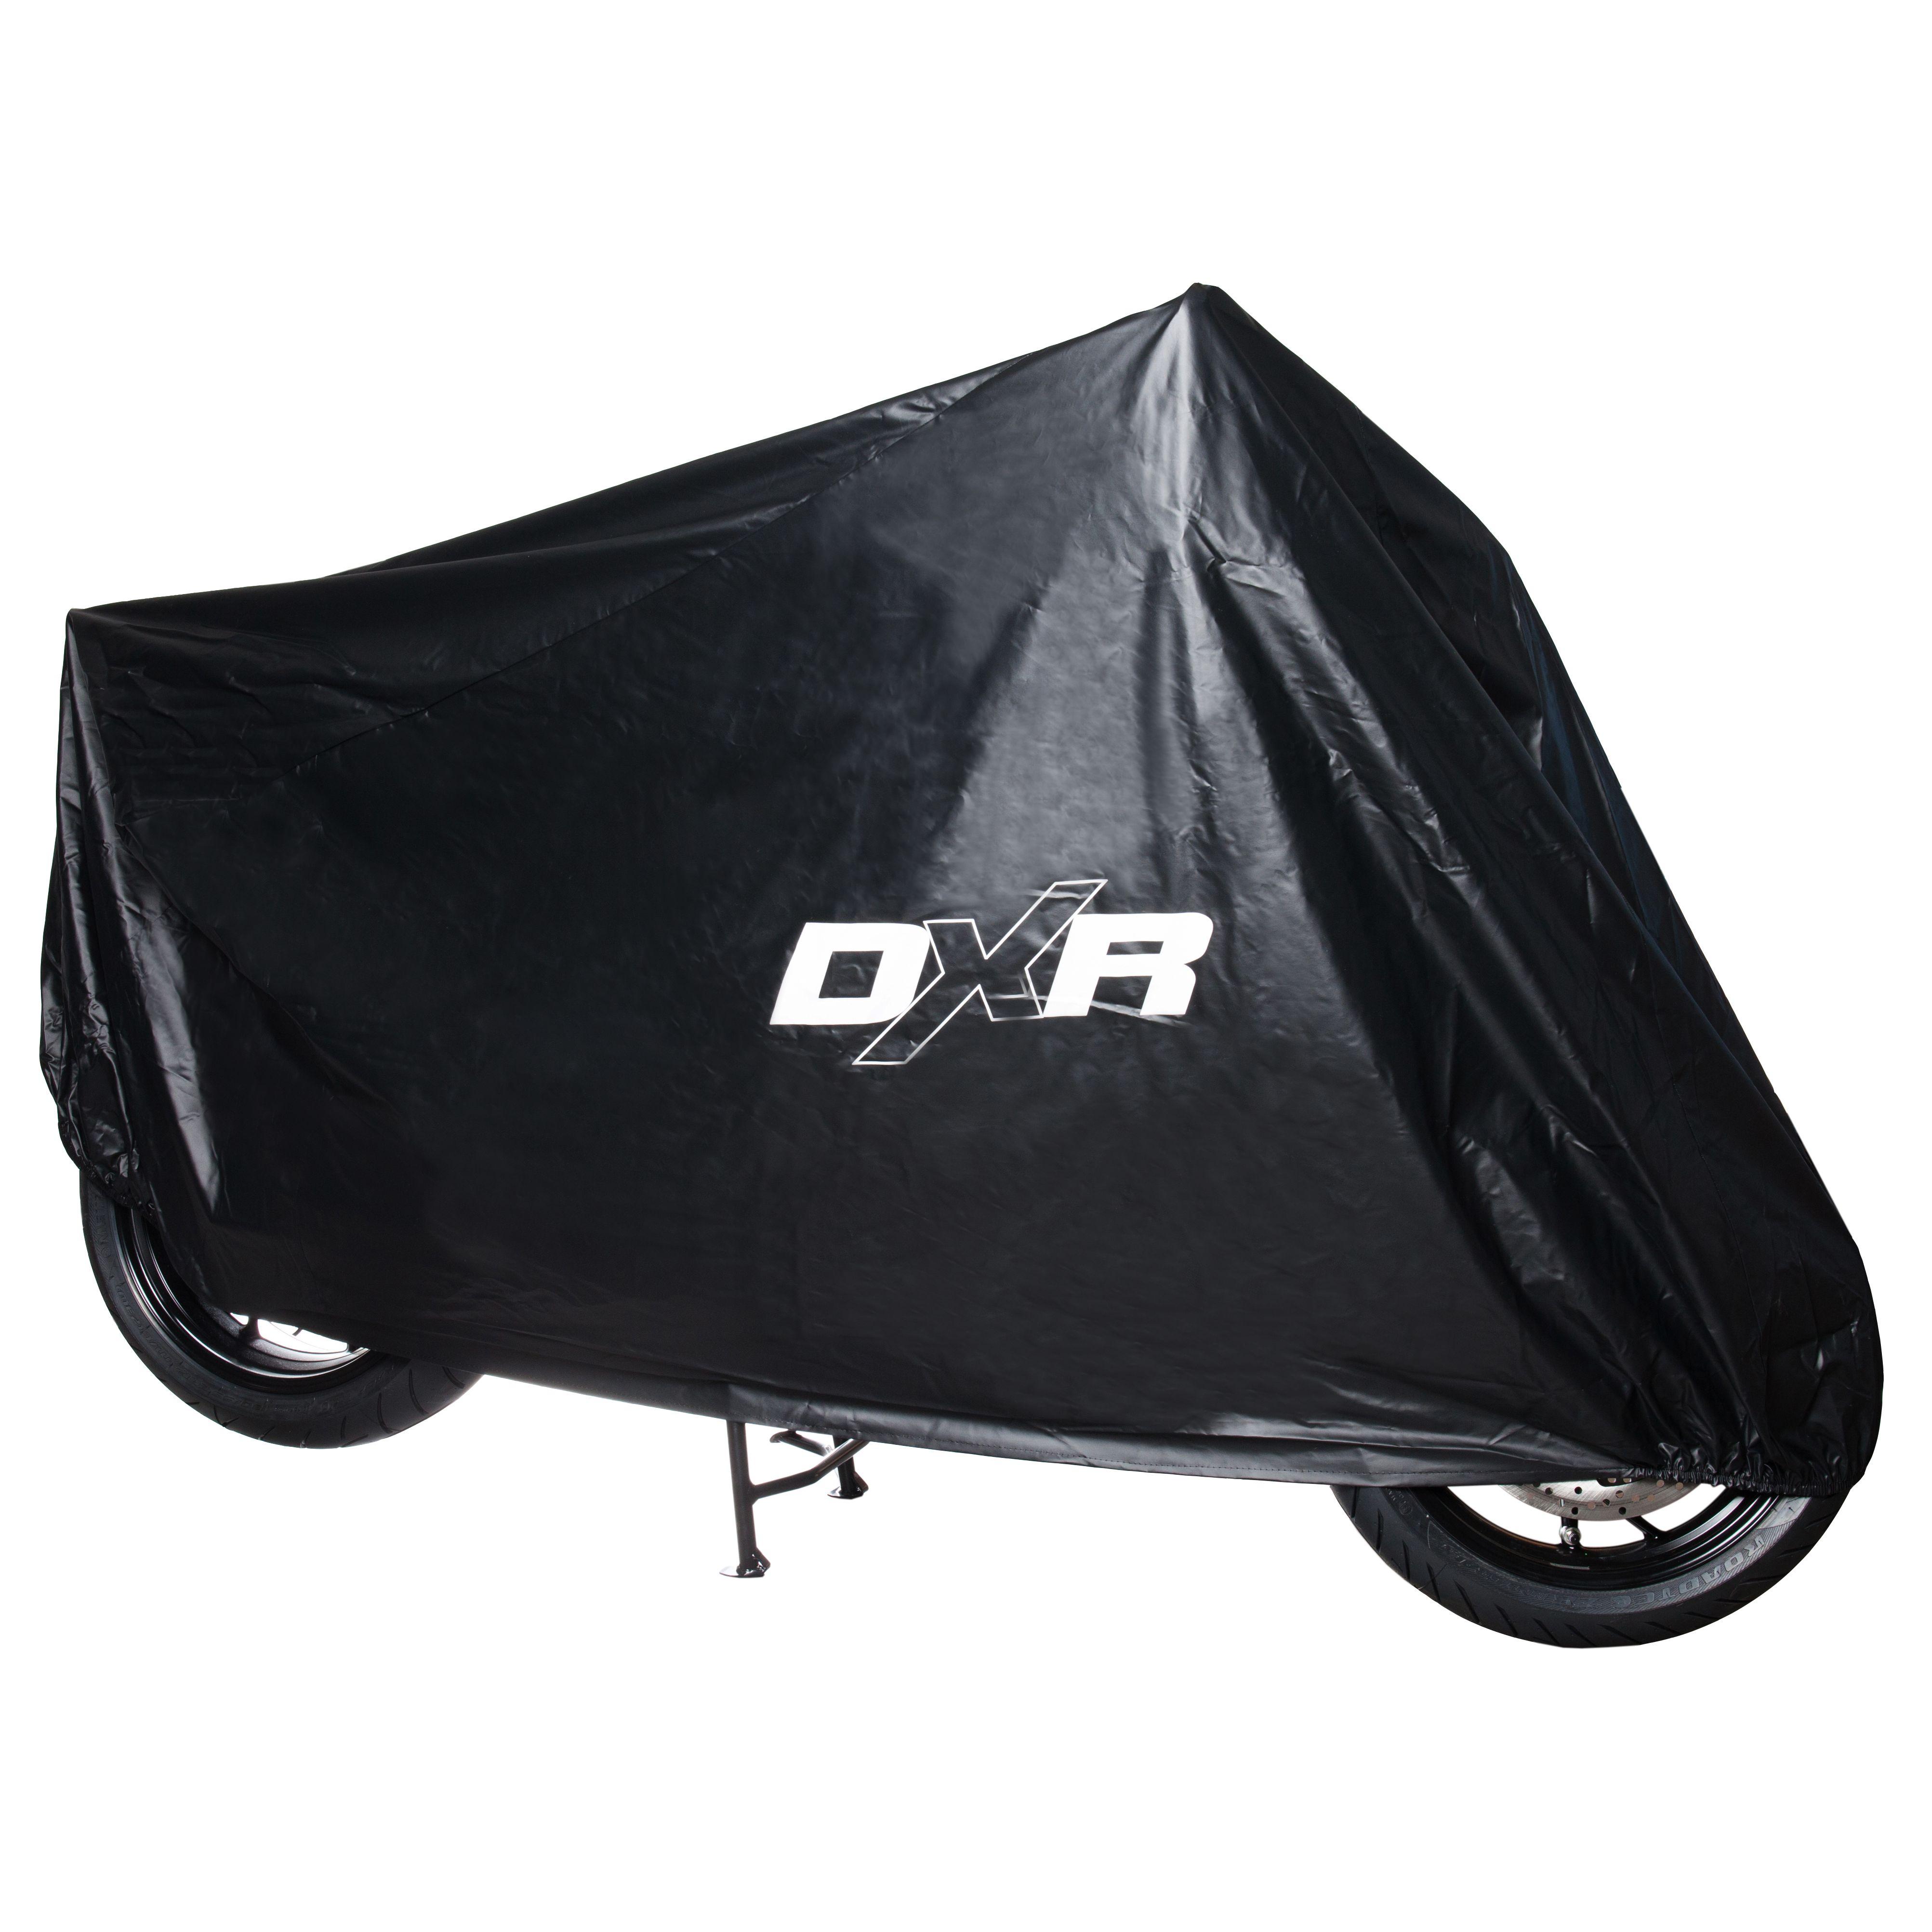 Housse Moto Dxr Bunker - Taille L